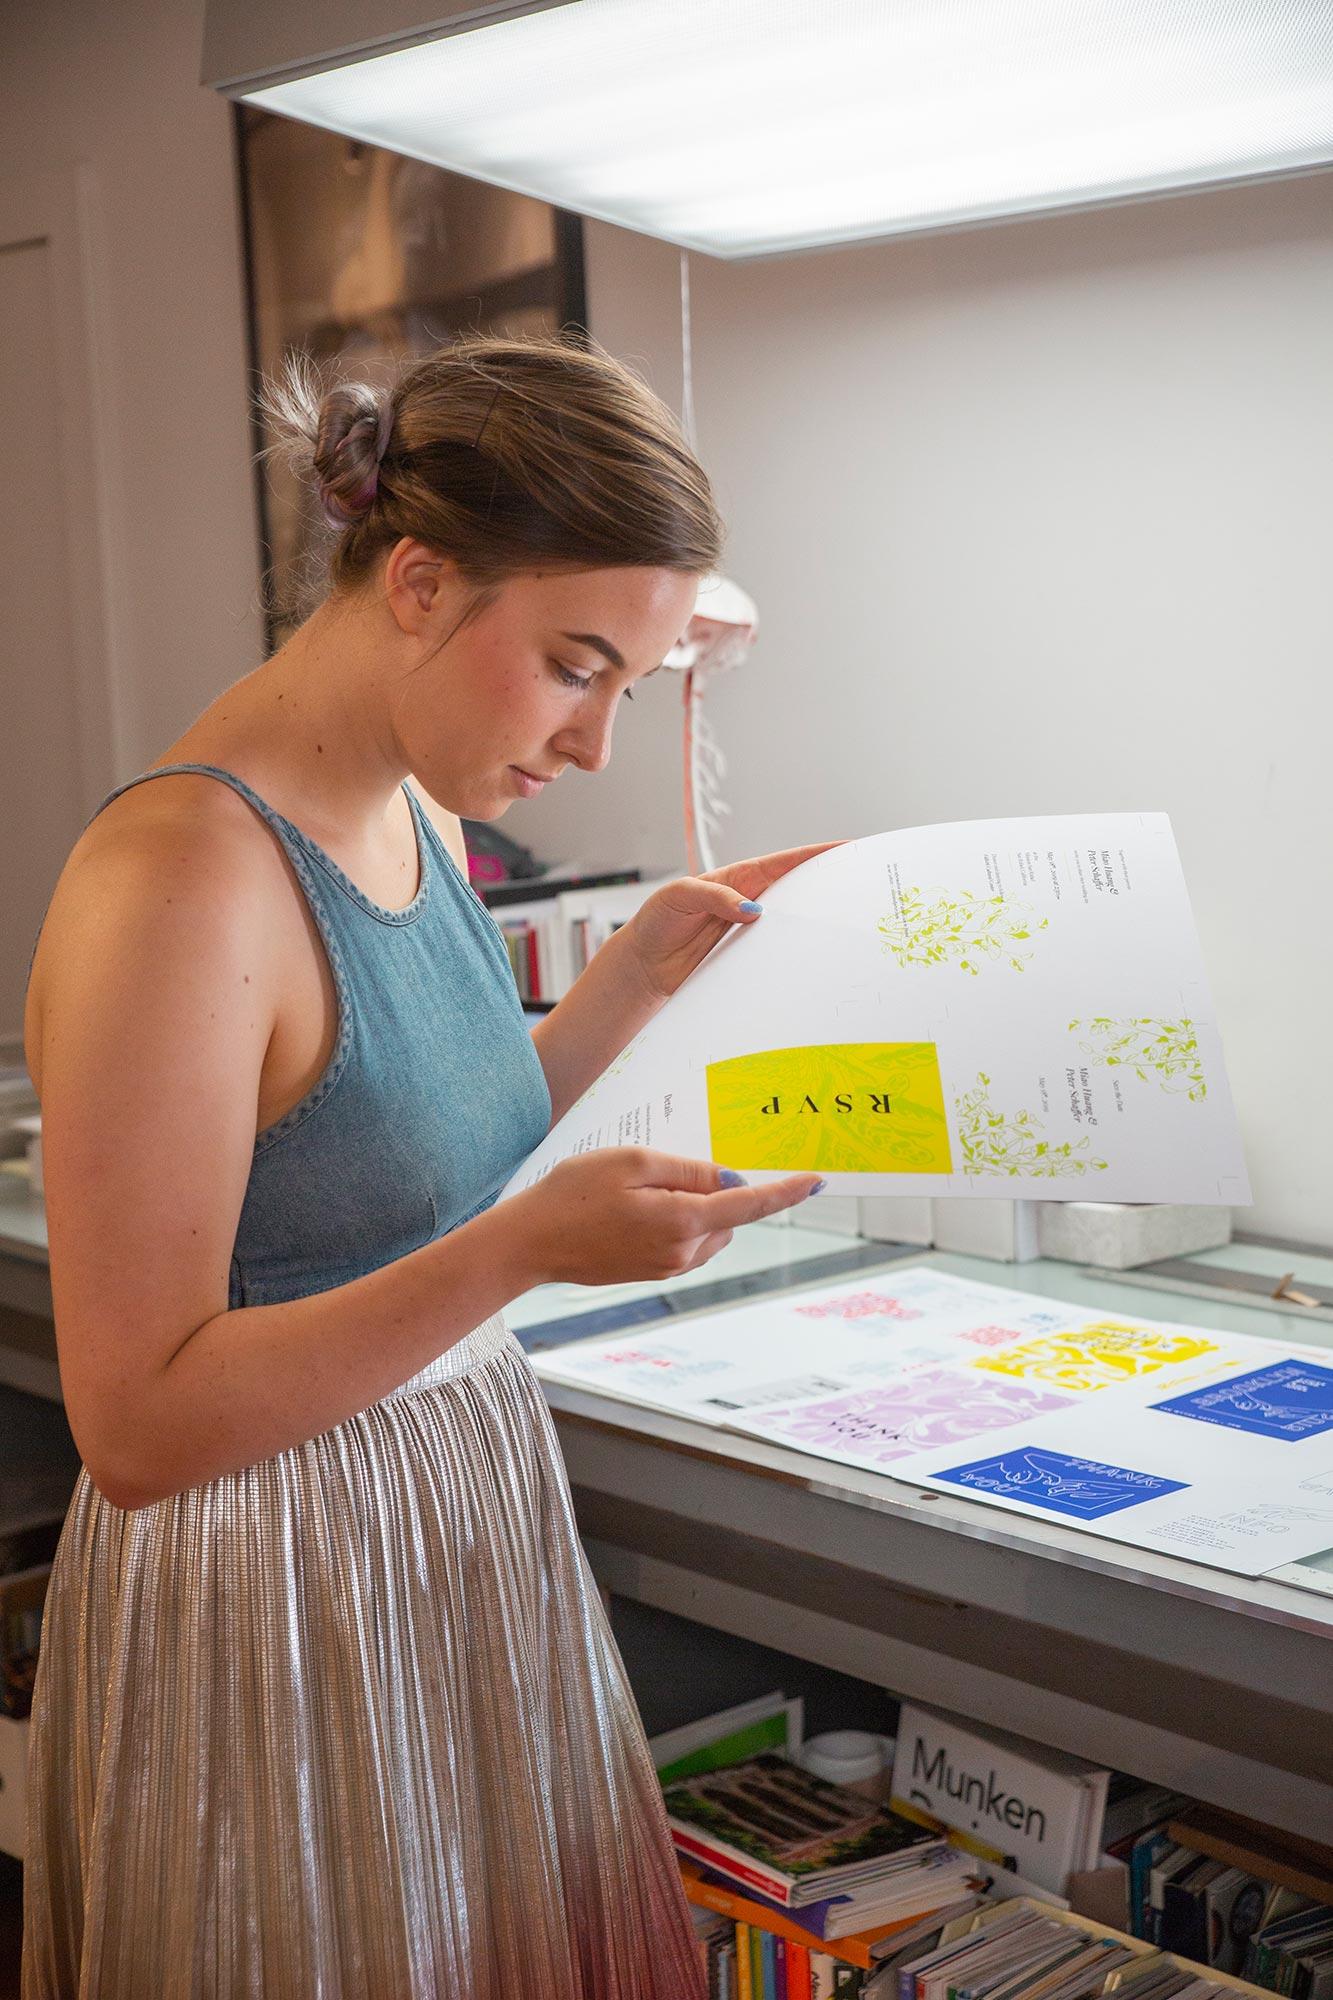 Natalie does press check on ficus wedding invitation suite design for gender-inclusive stationery studio ephemora